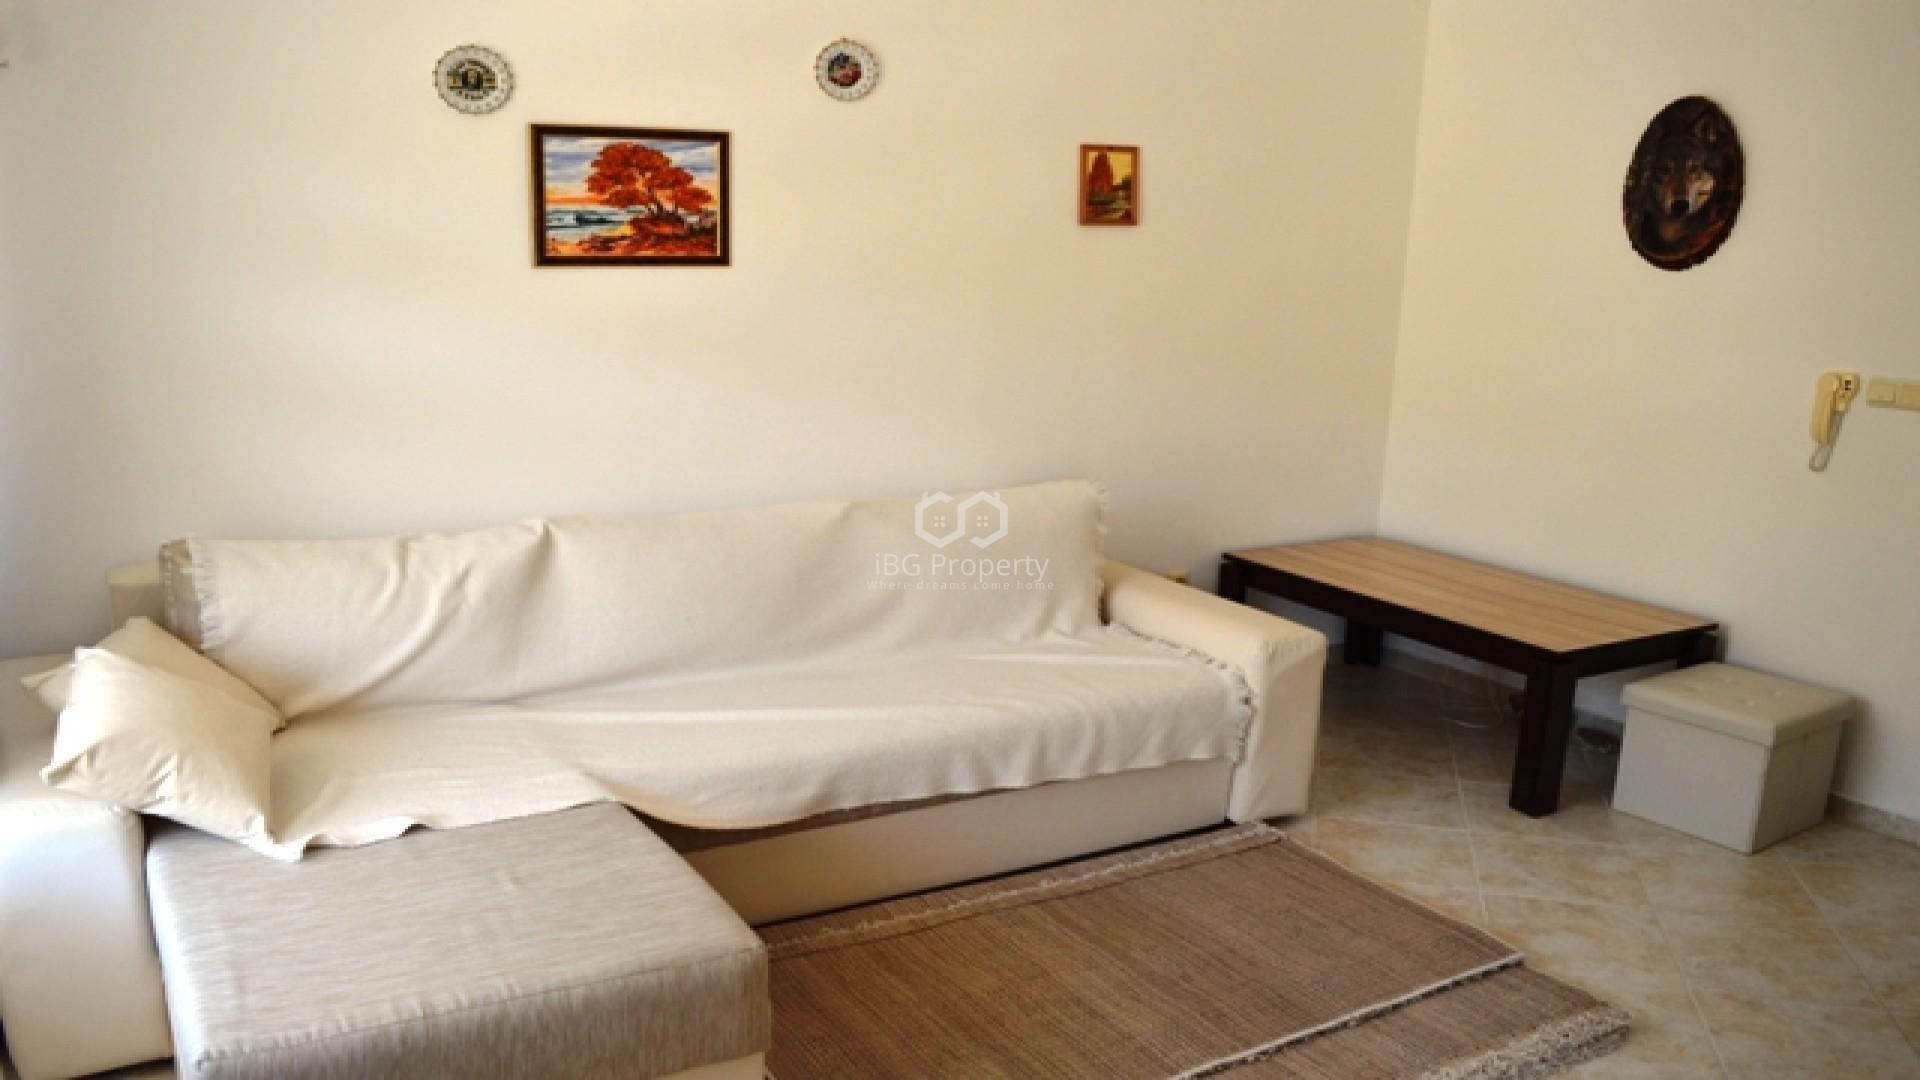 Однокомнатная квартира Кошарица 32 m2